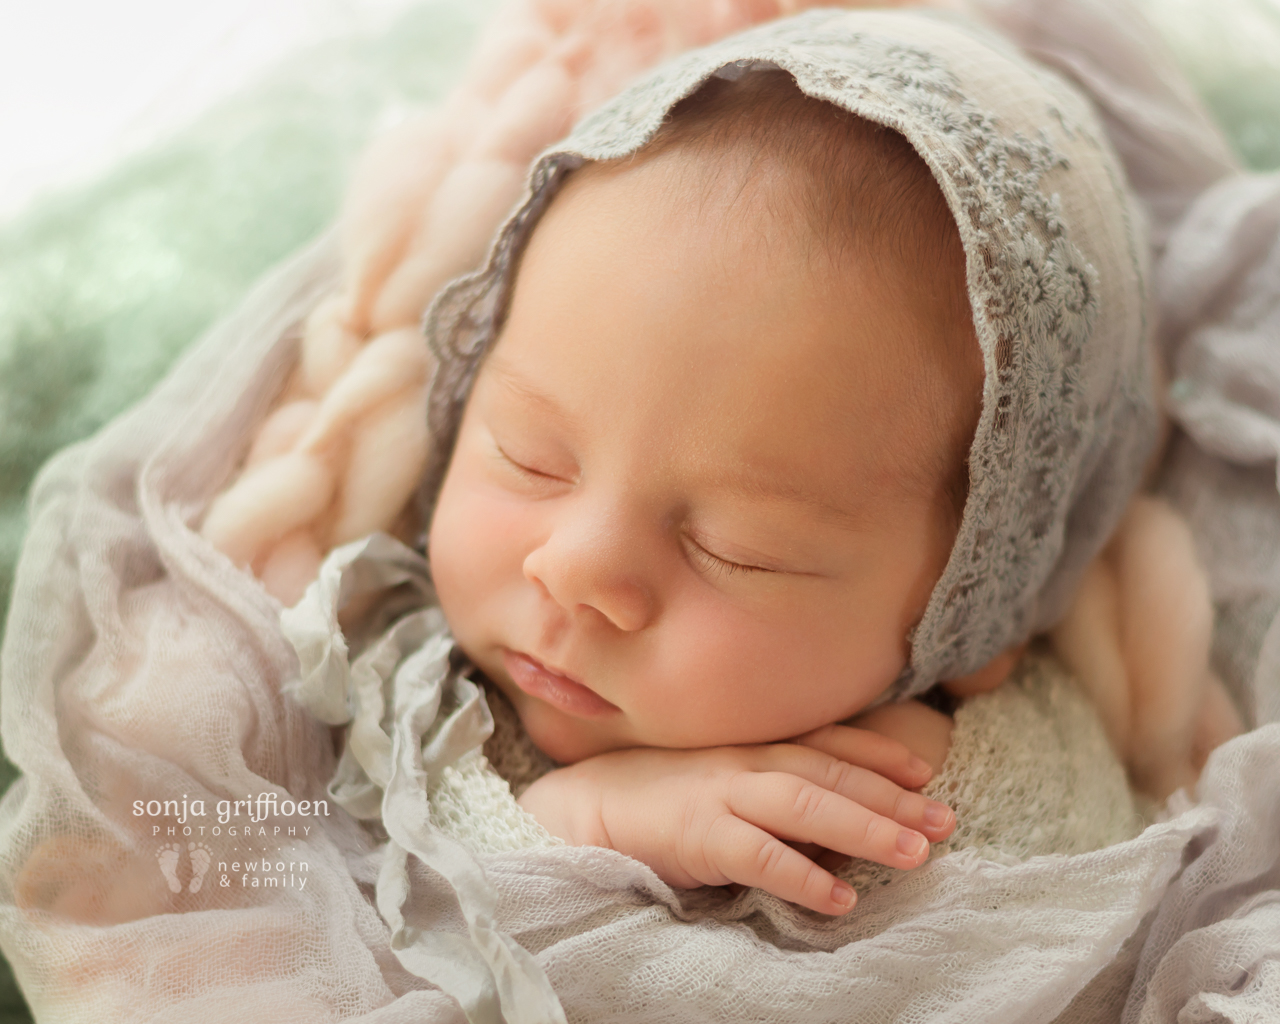 Thalia-Newborn-Brisbane-Newborn-Photographer-Sonja-Griffioen-05.jpg